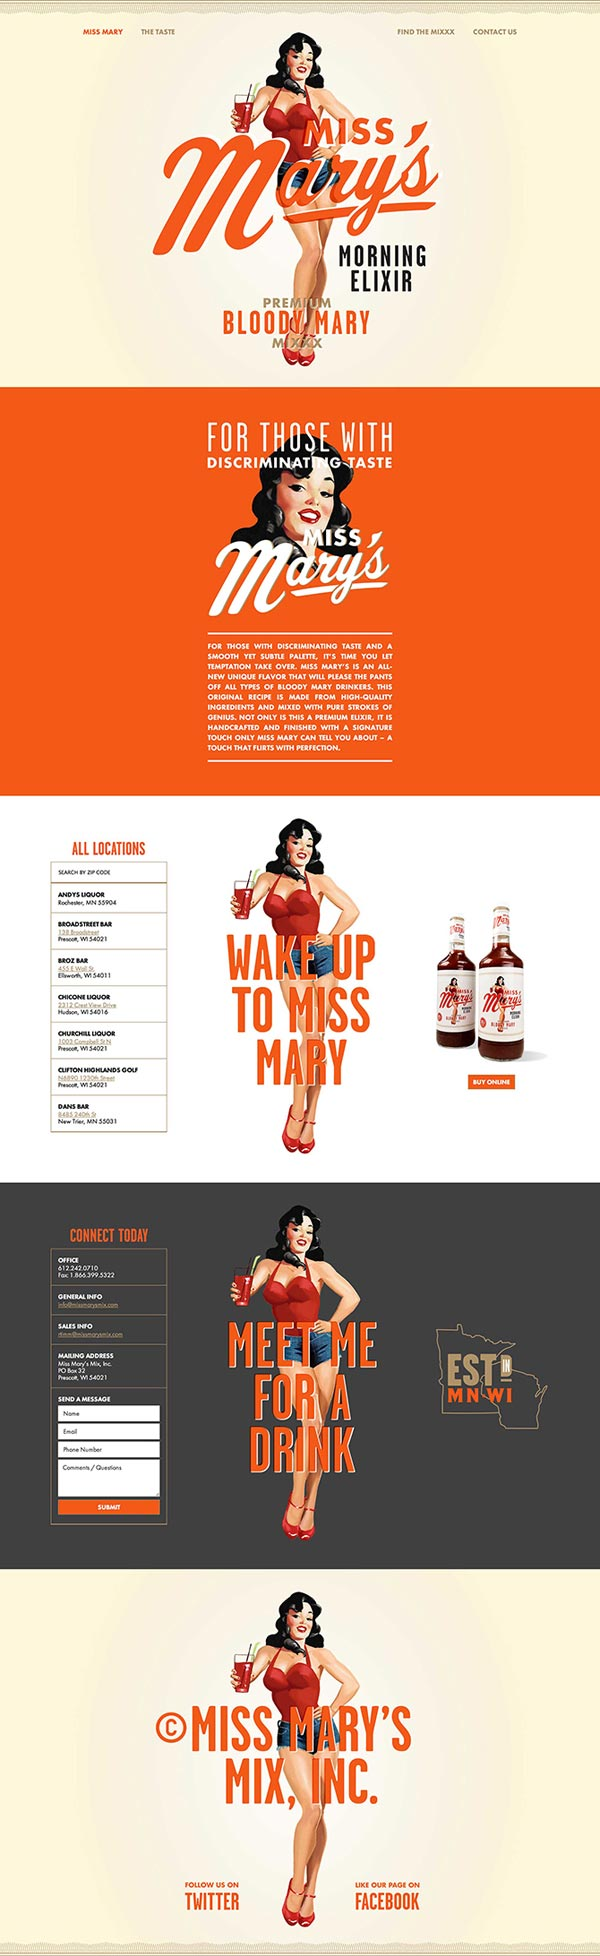 Miss Mary's Morning Elixir - Web Design by Brandon Van Liere